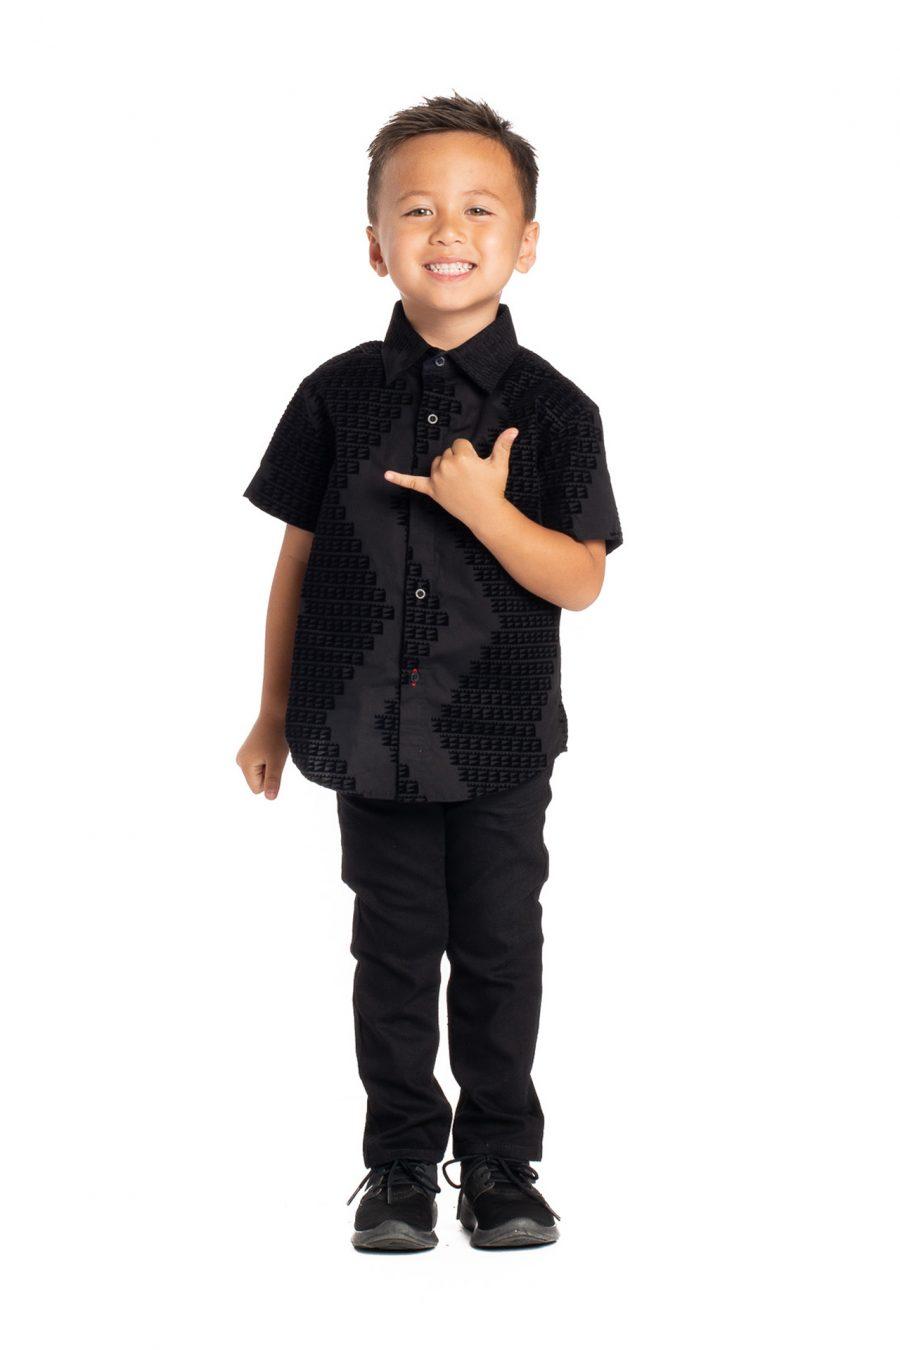 Boy wearing Keiki Aloha Short Sleeve in Black Niho Mano - Front View